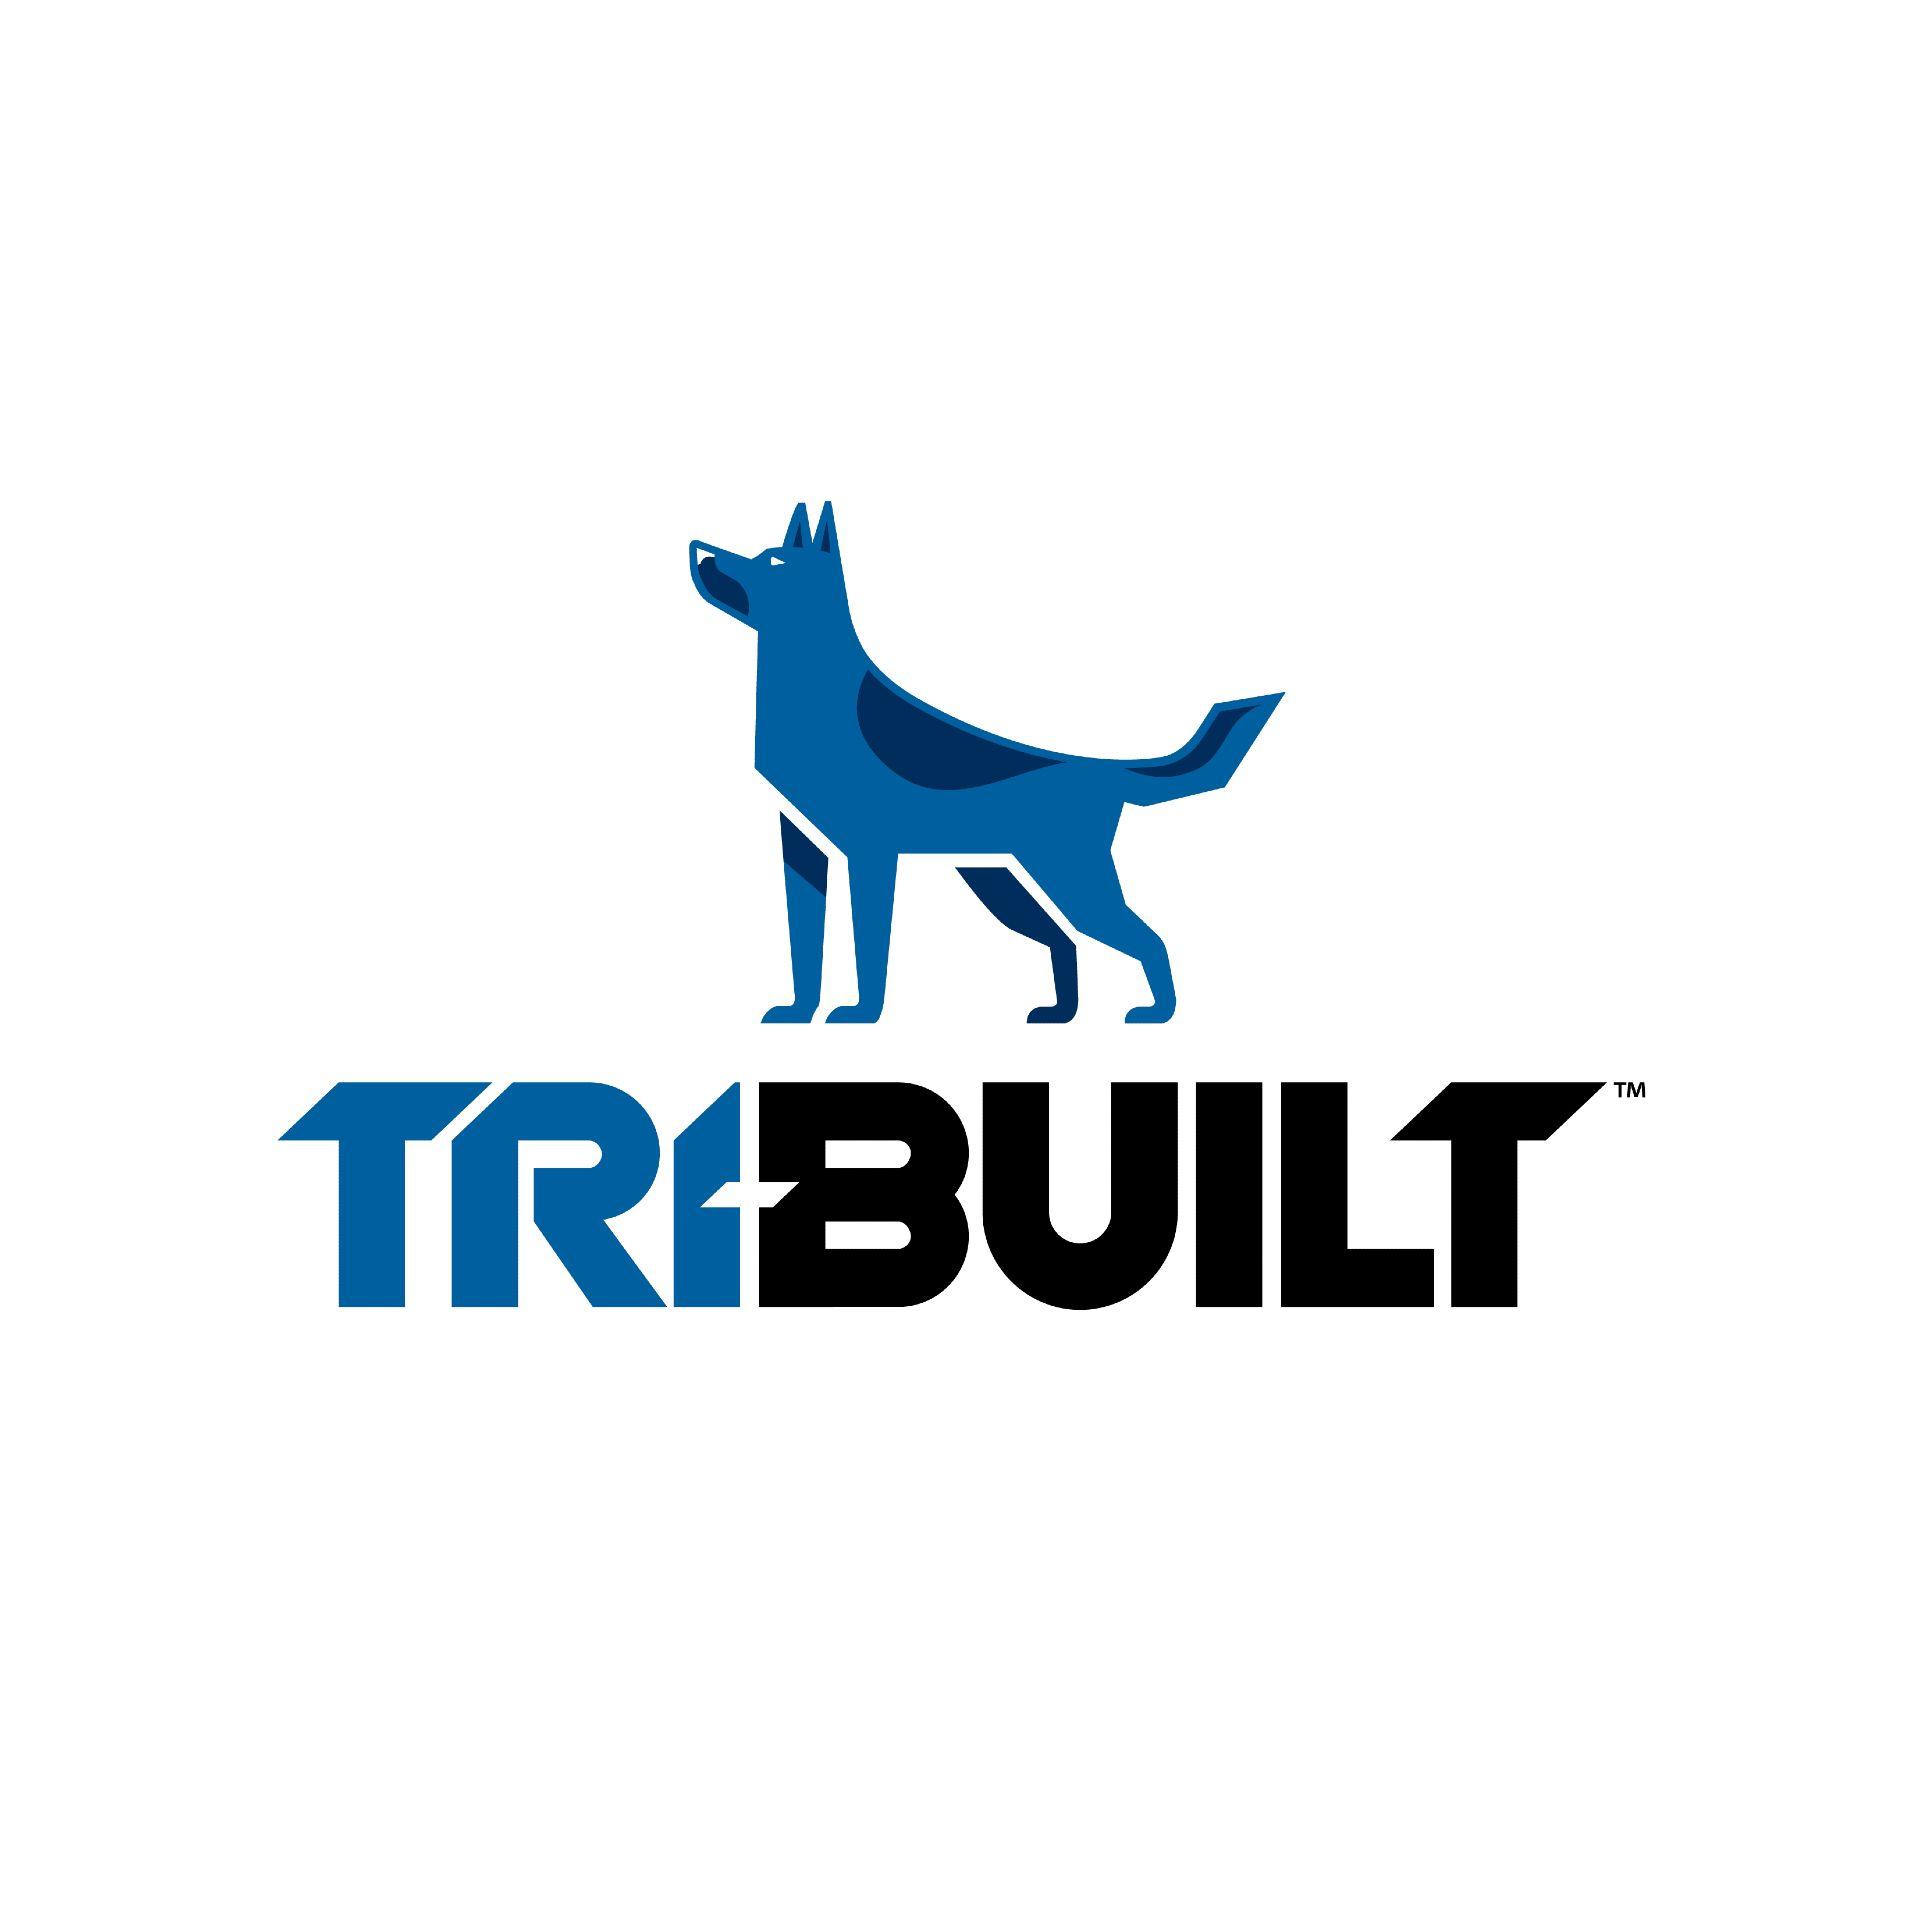 "TRI-BUILT 5"" x 4' TitanGuard™ Step-Up Profile Aluminum Gutter Cover Mill"